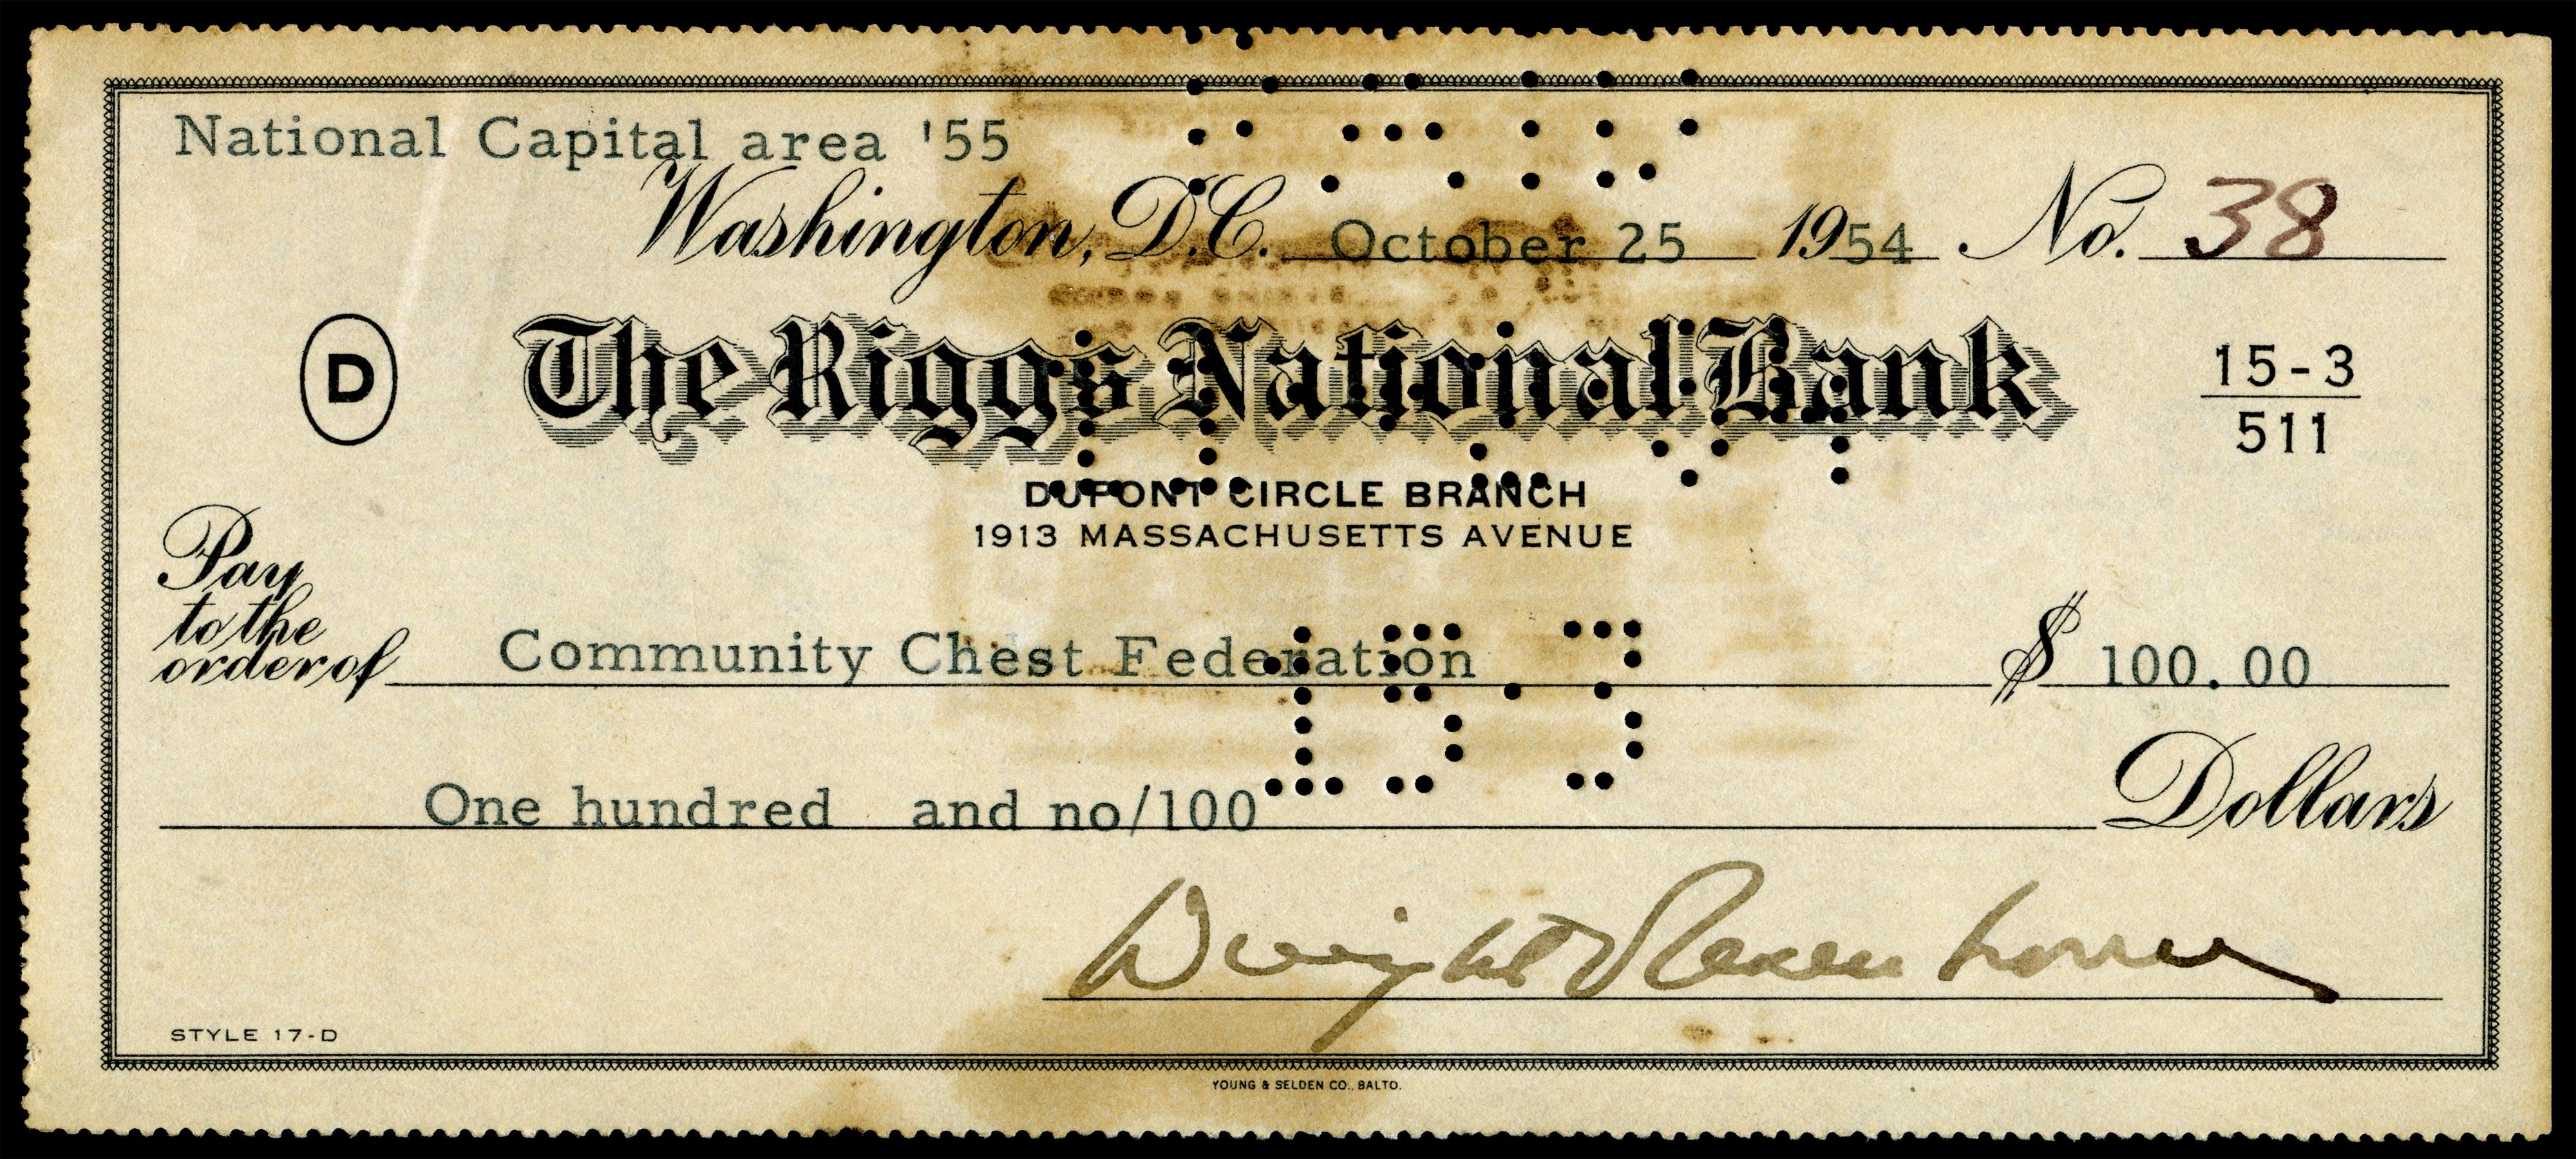 File:EISENHOWER, Dwight (signed check).jpg - Wikimedia Commons